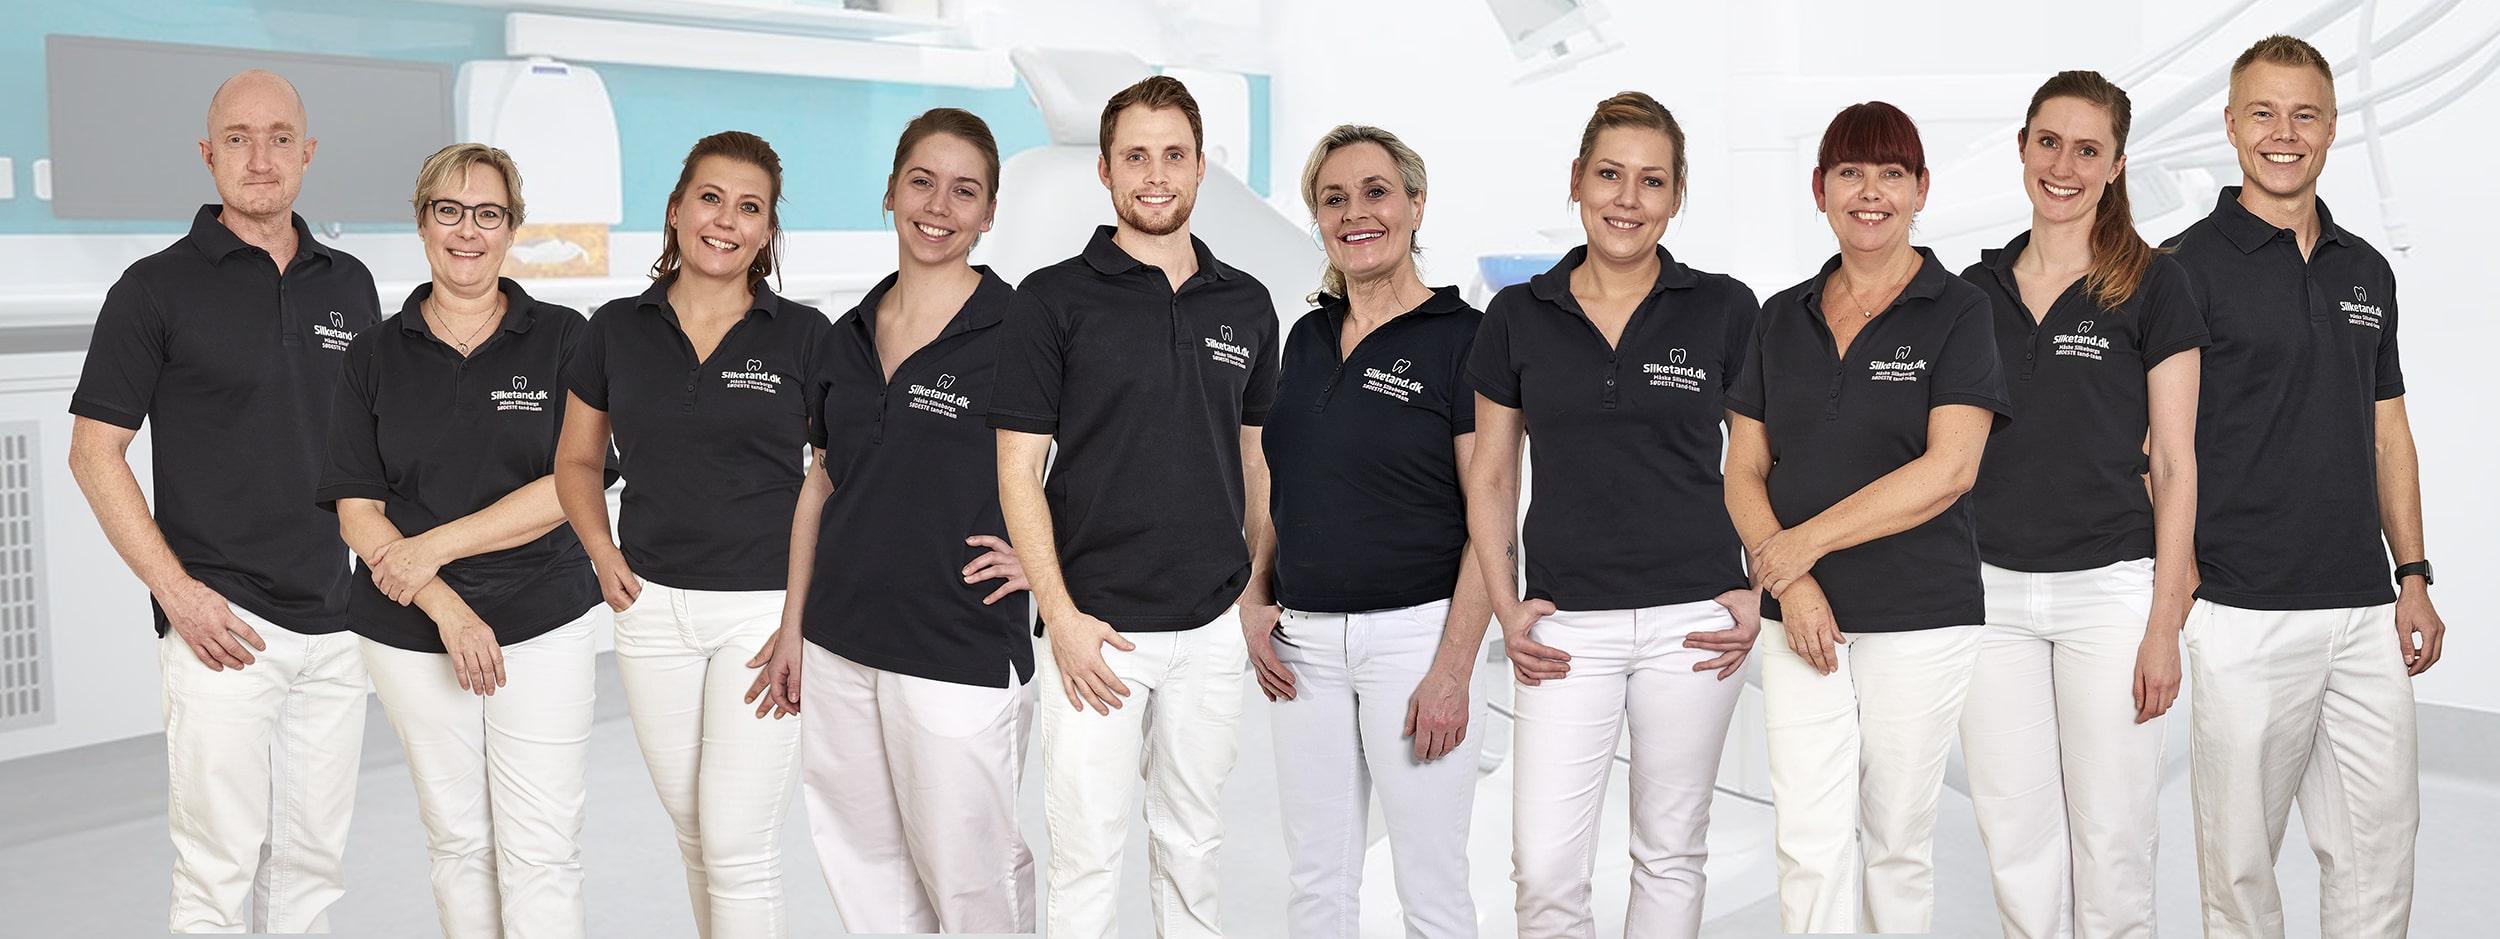 Tandlæge Silkeborg